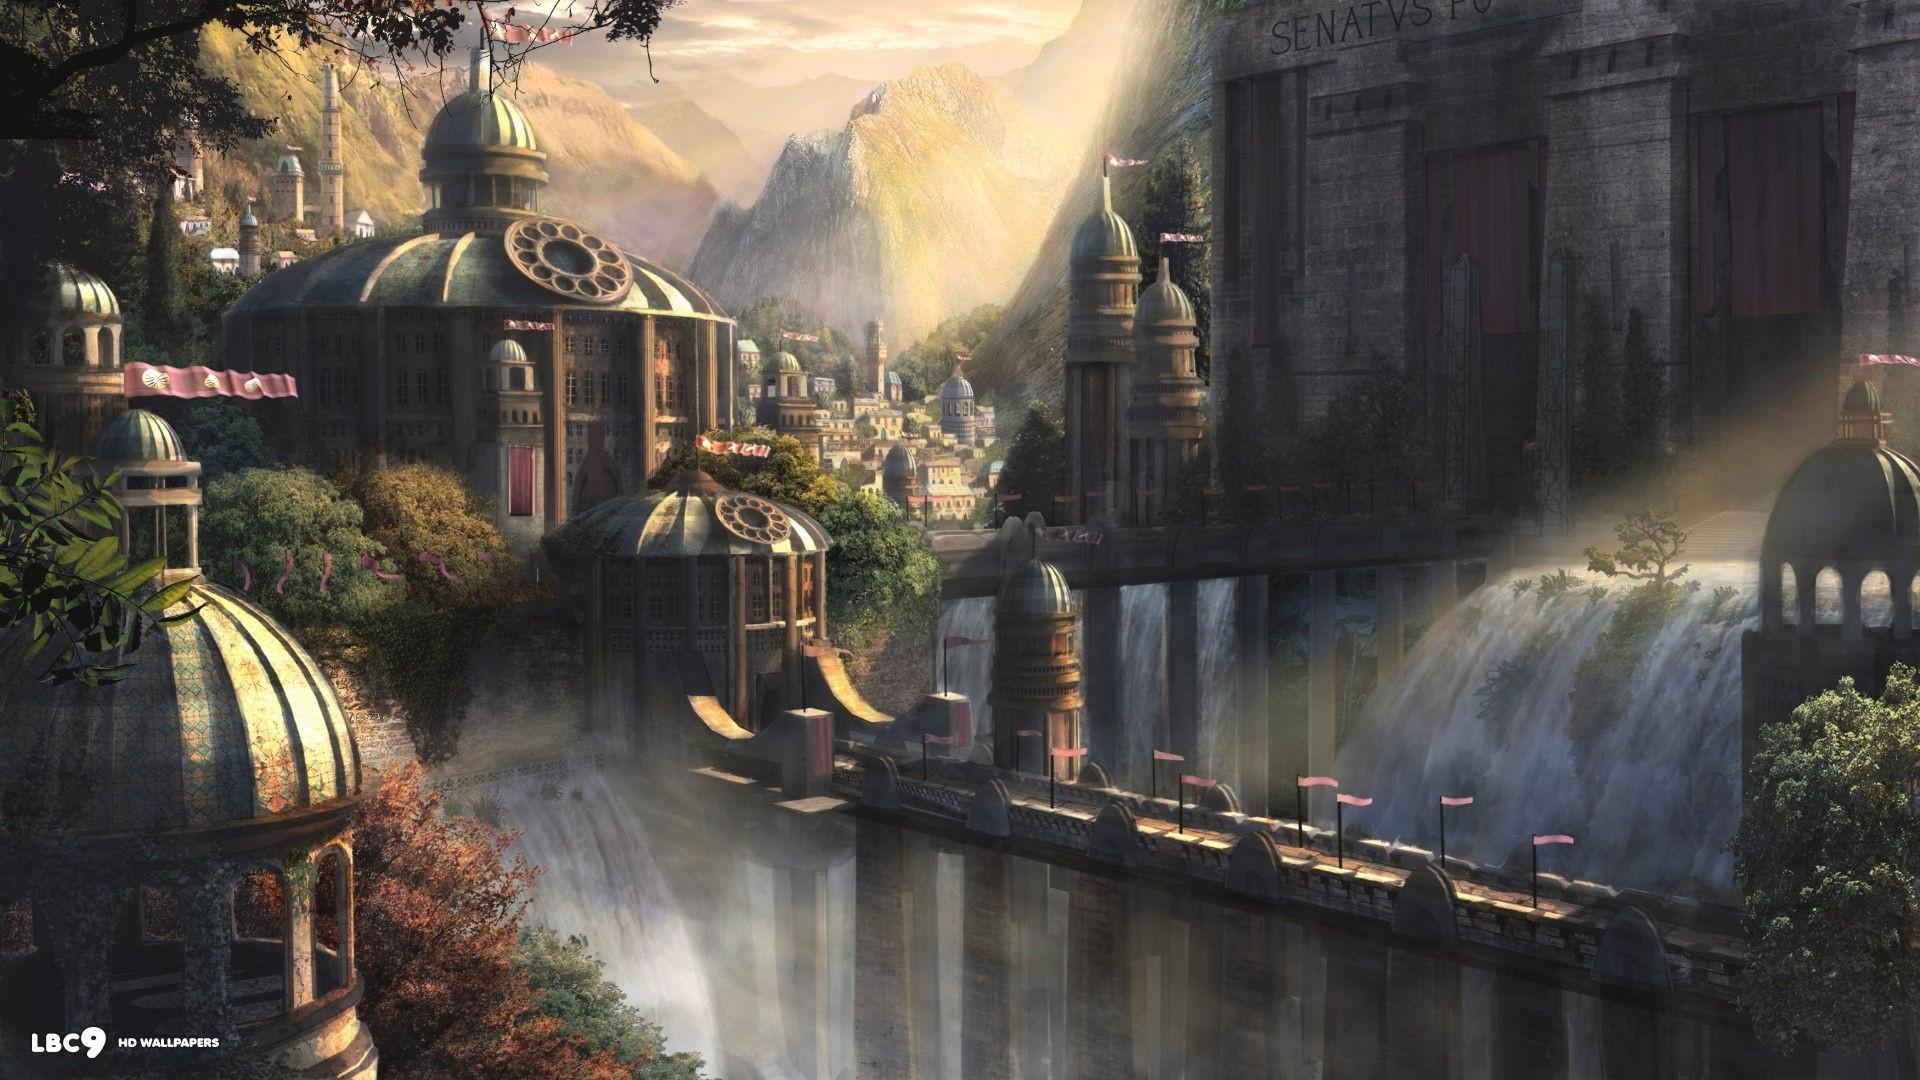 Fantasy – Castle – Phantasmagoria – Room – Black – Hd – Ultrahd – 4k –  Artistic – Fantasy Wallpaper | Environment | Pinterest | Fantasy castle,  Wallpaper …